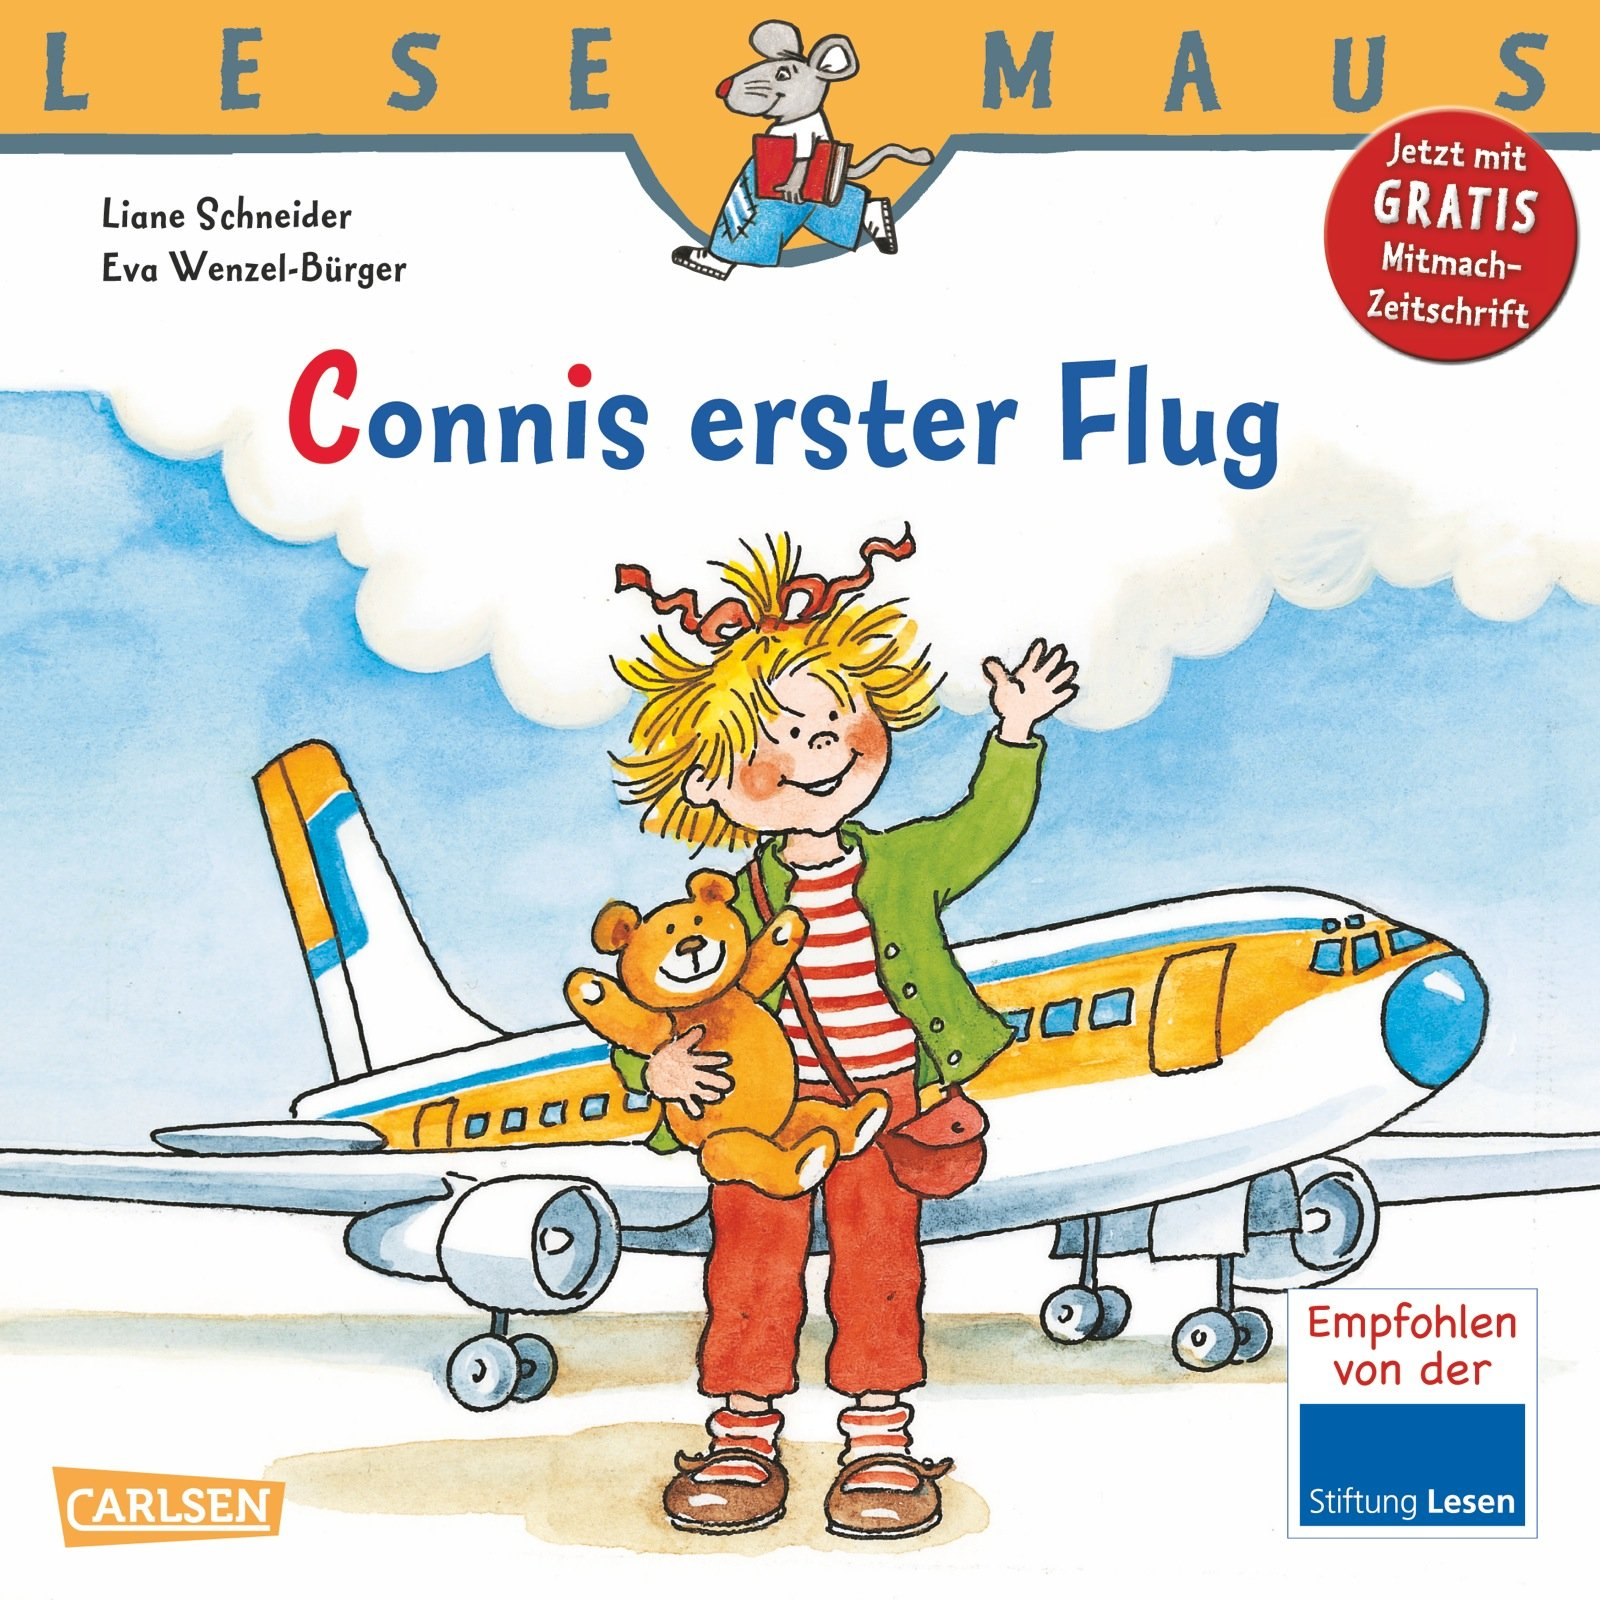 LESEMAUS, Band 91: Connis erster Flug